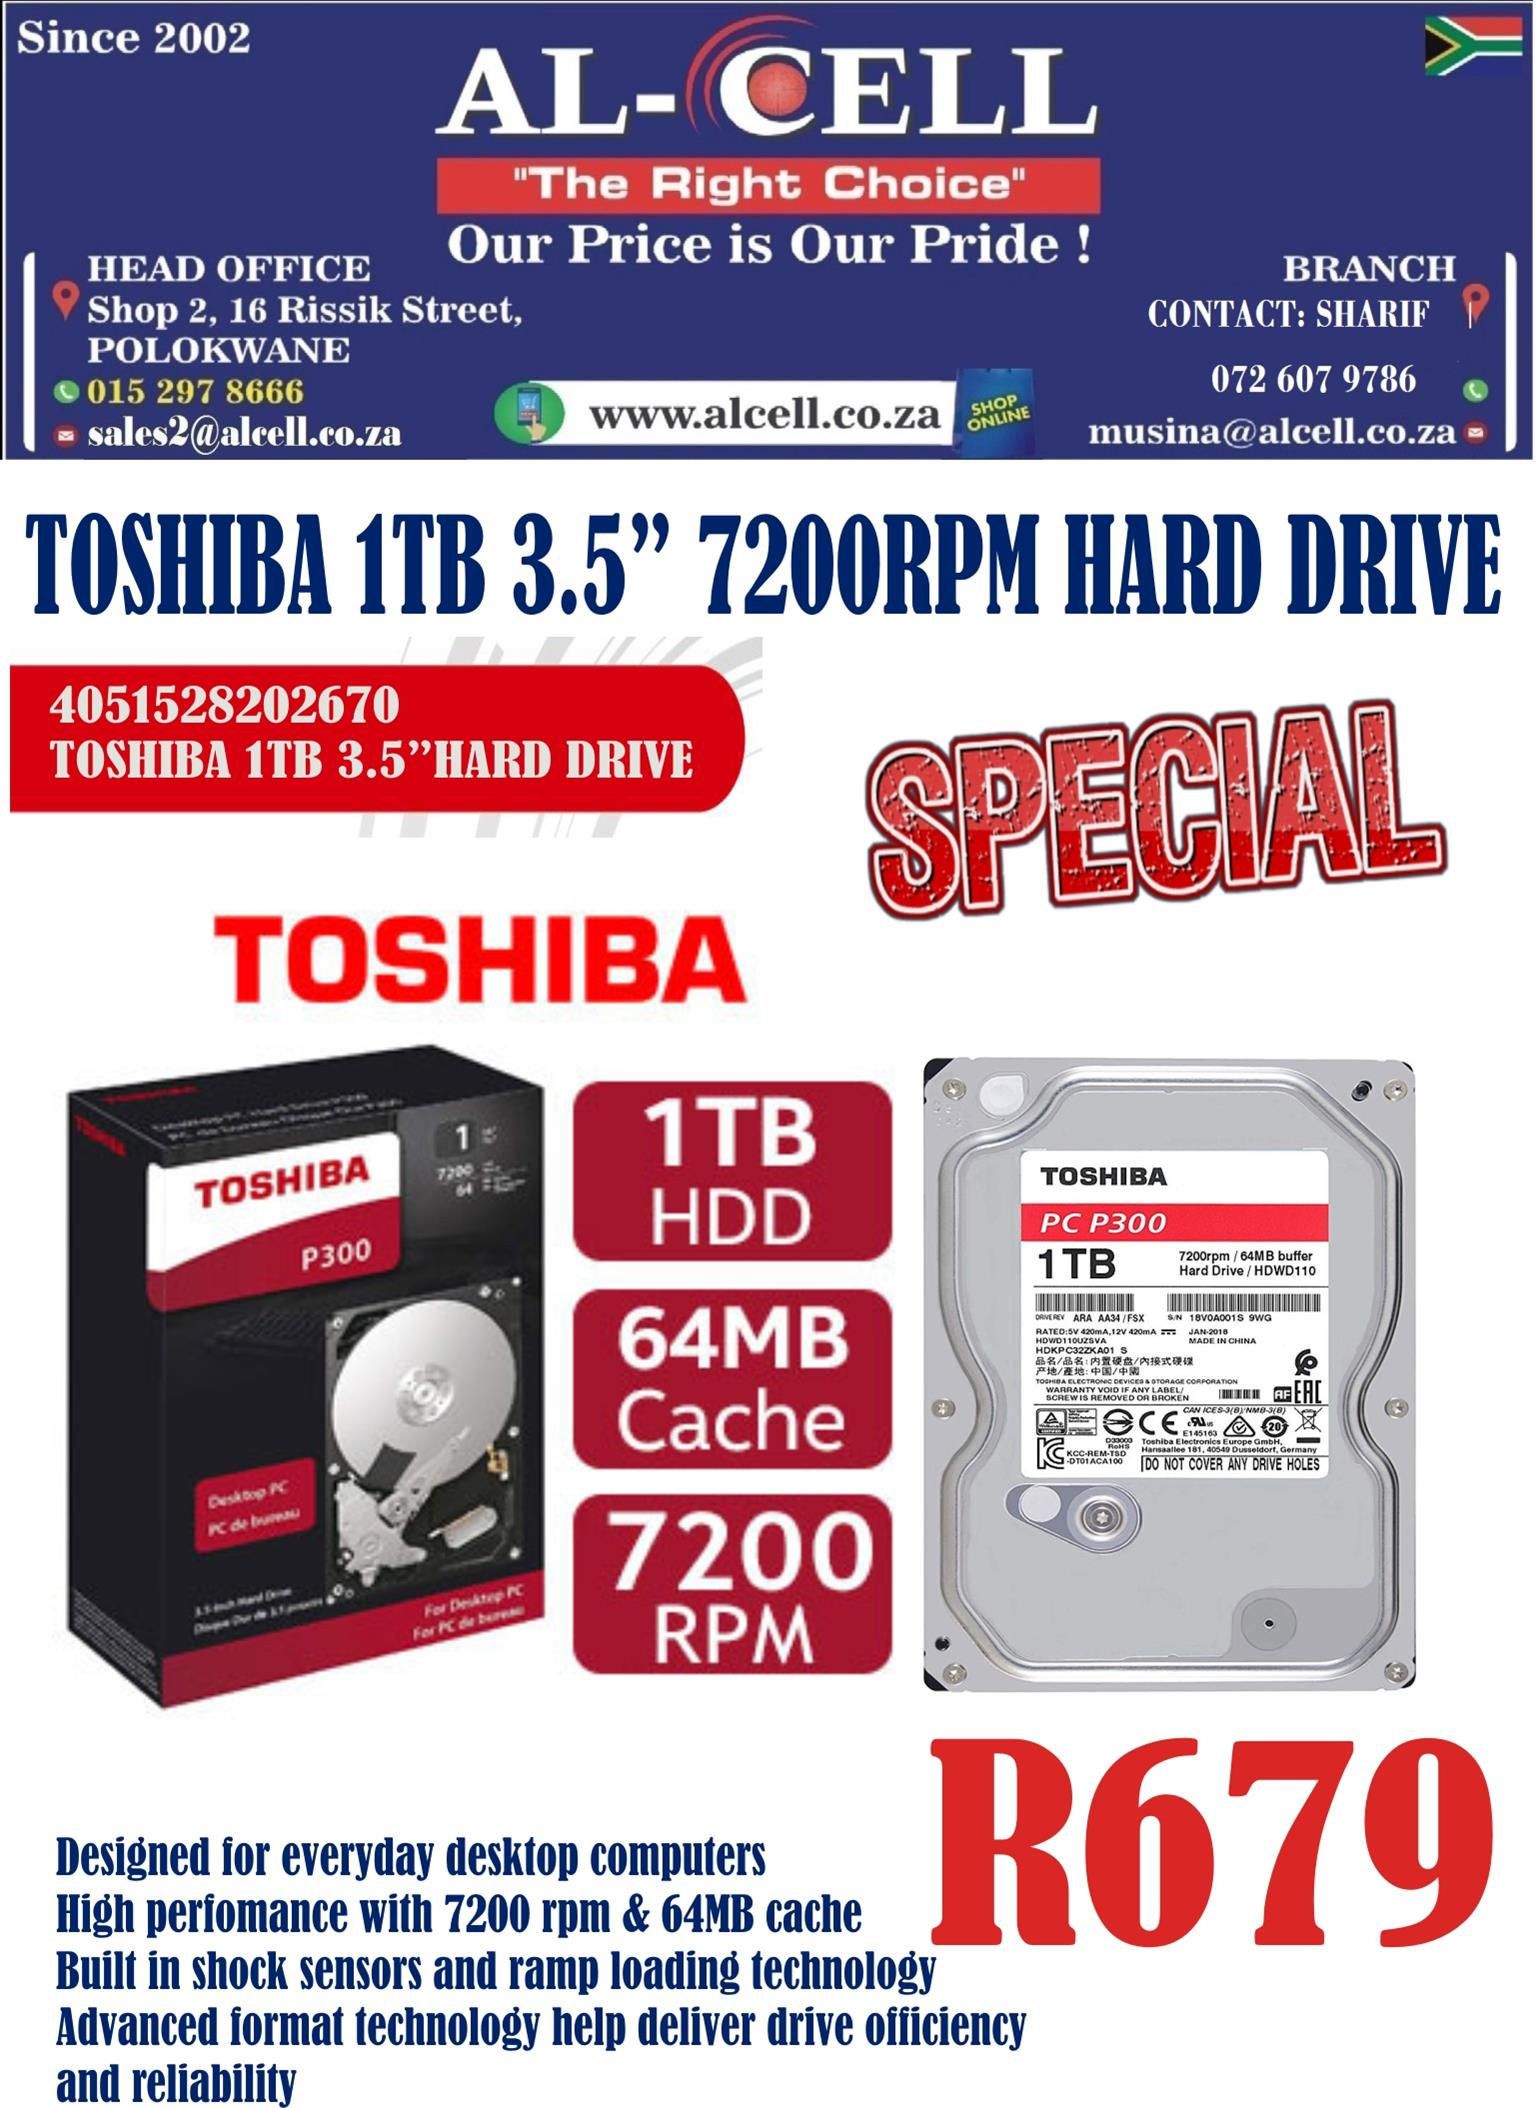 Toshiba 1TB 3.5″ Inch 7200 RPM Internal Hard Drive